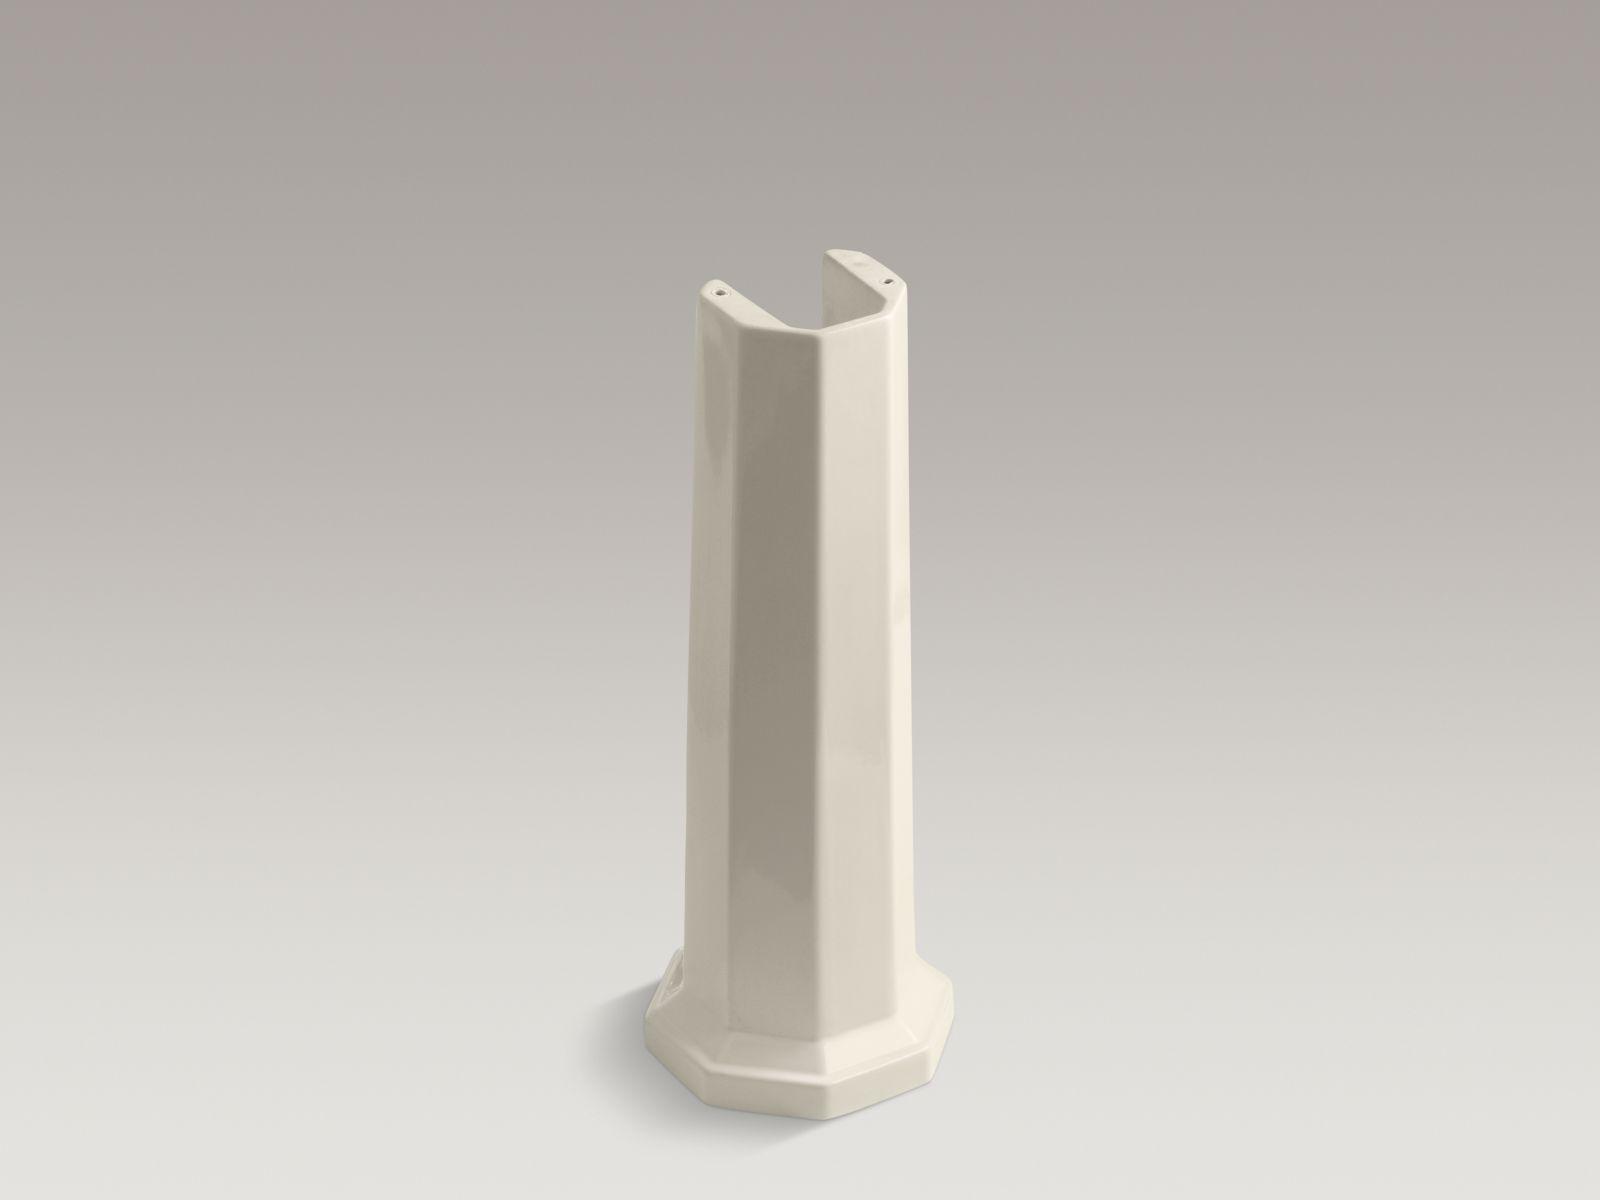 Kohler K-2324-47 Kathryn Lavatory Pedestal Almond